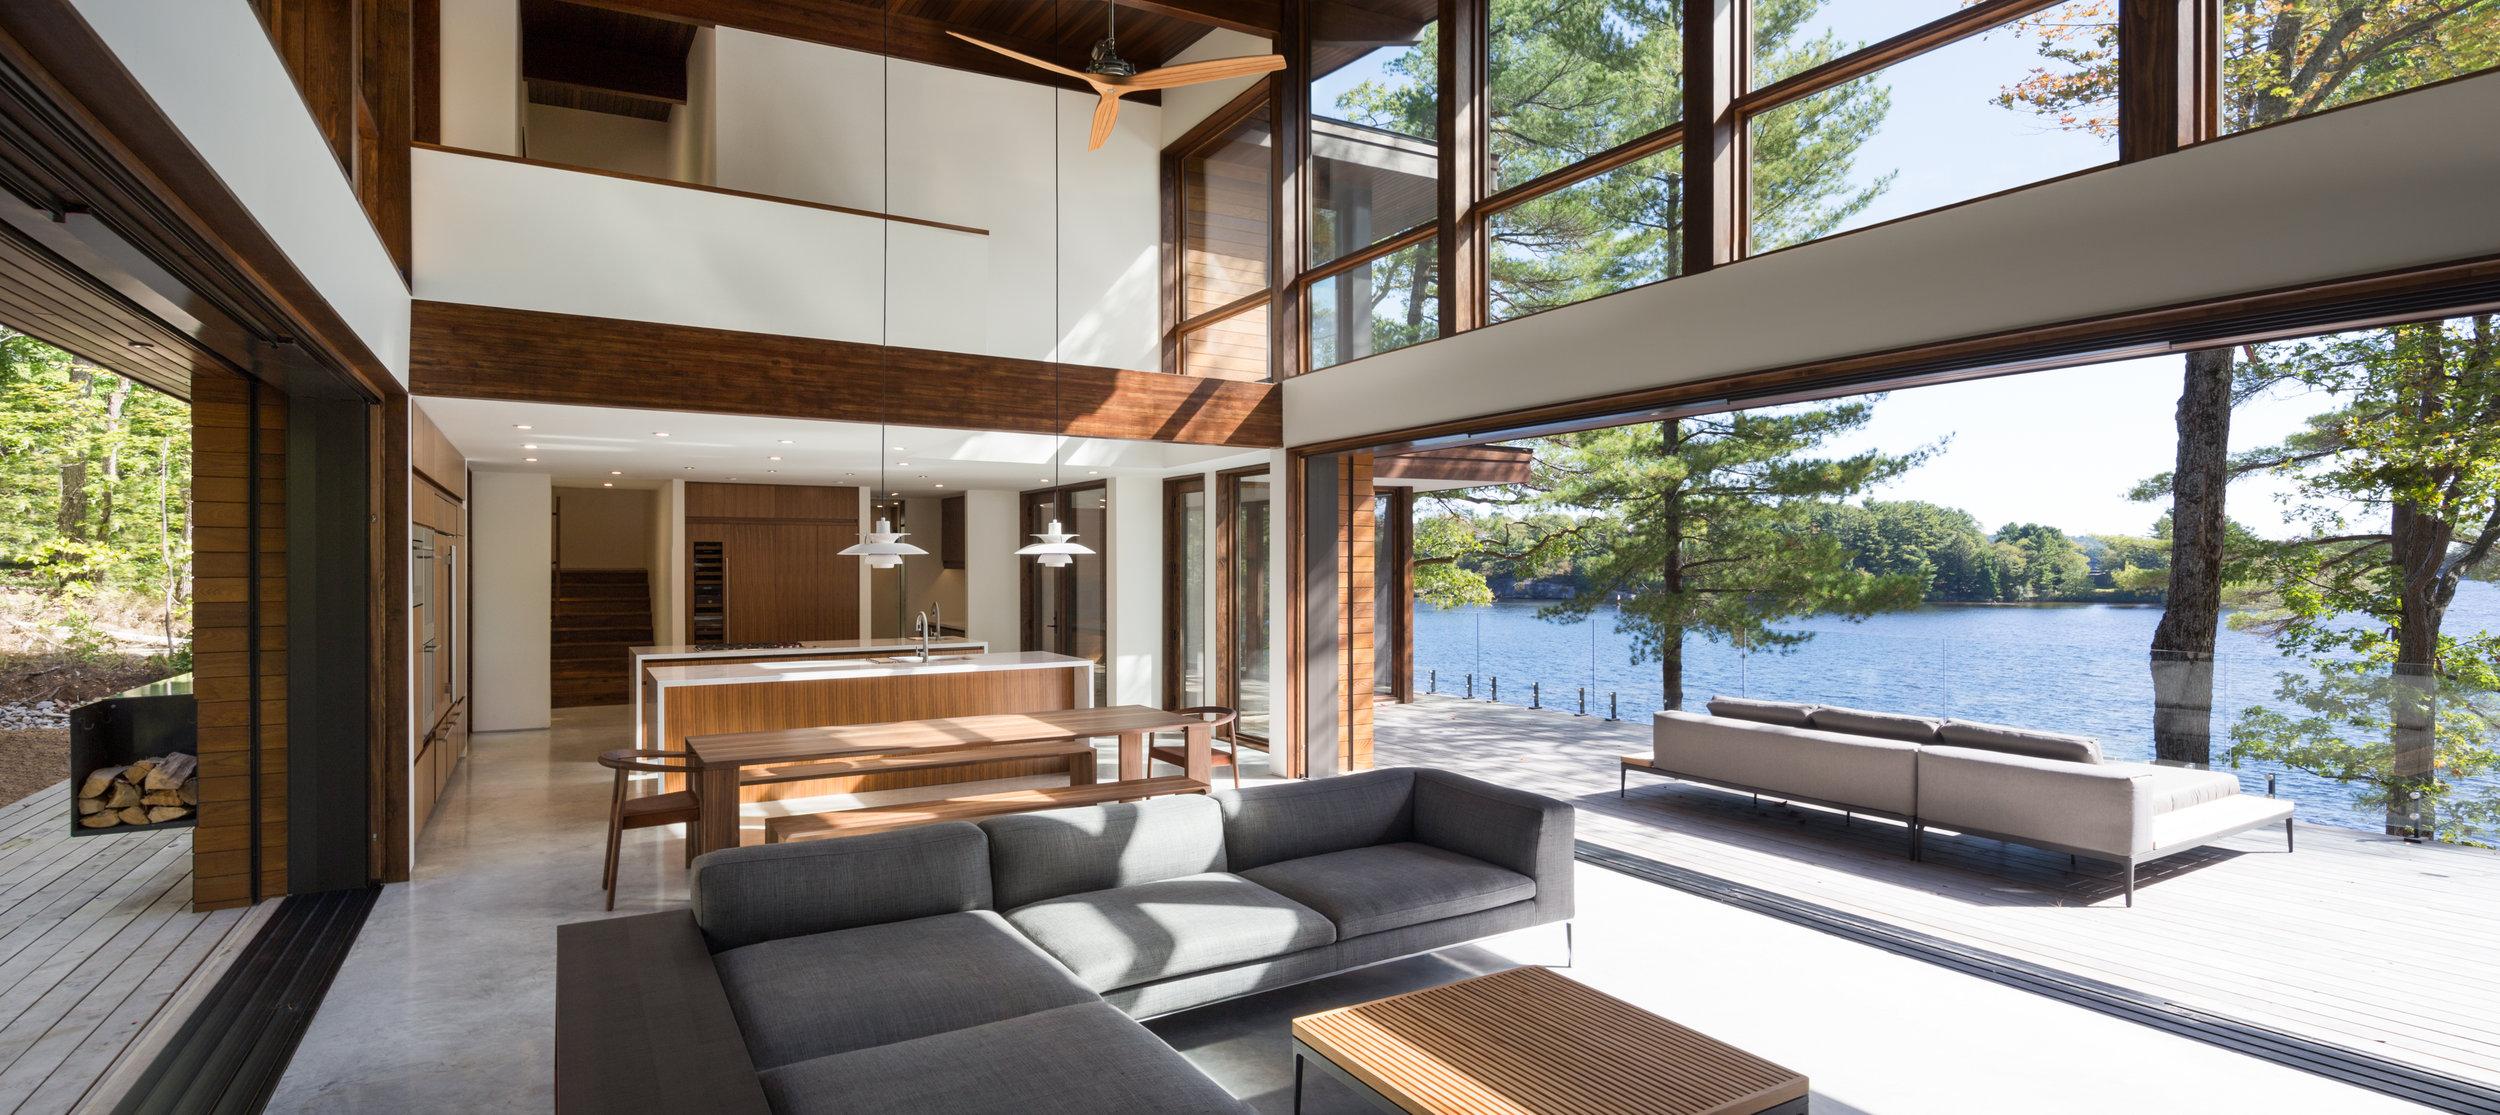 turkel_design_modern_prefab_home_great_room_view.jpg